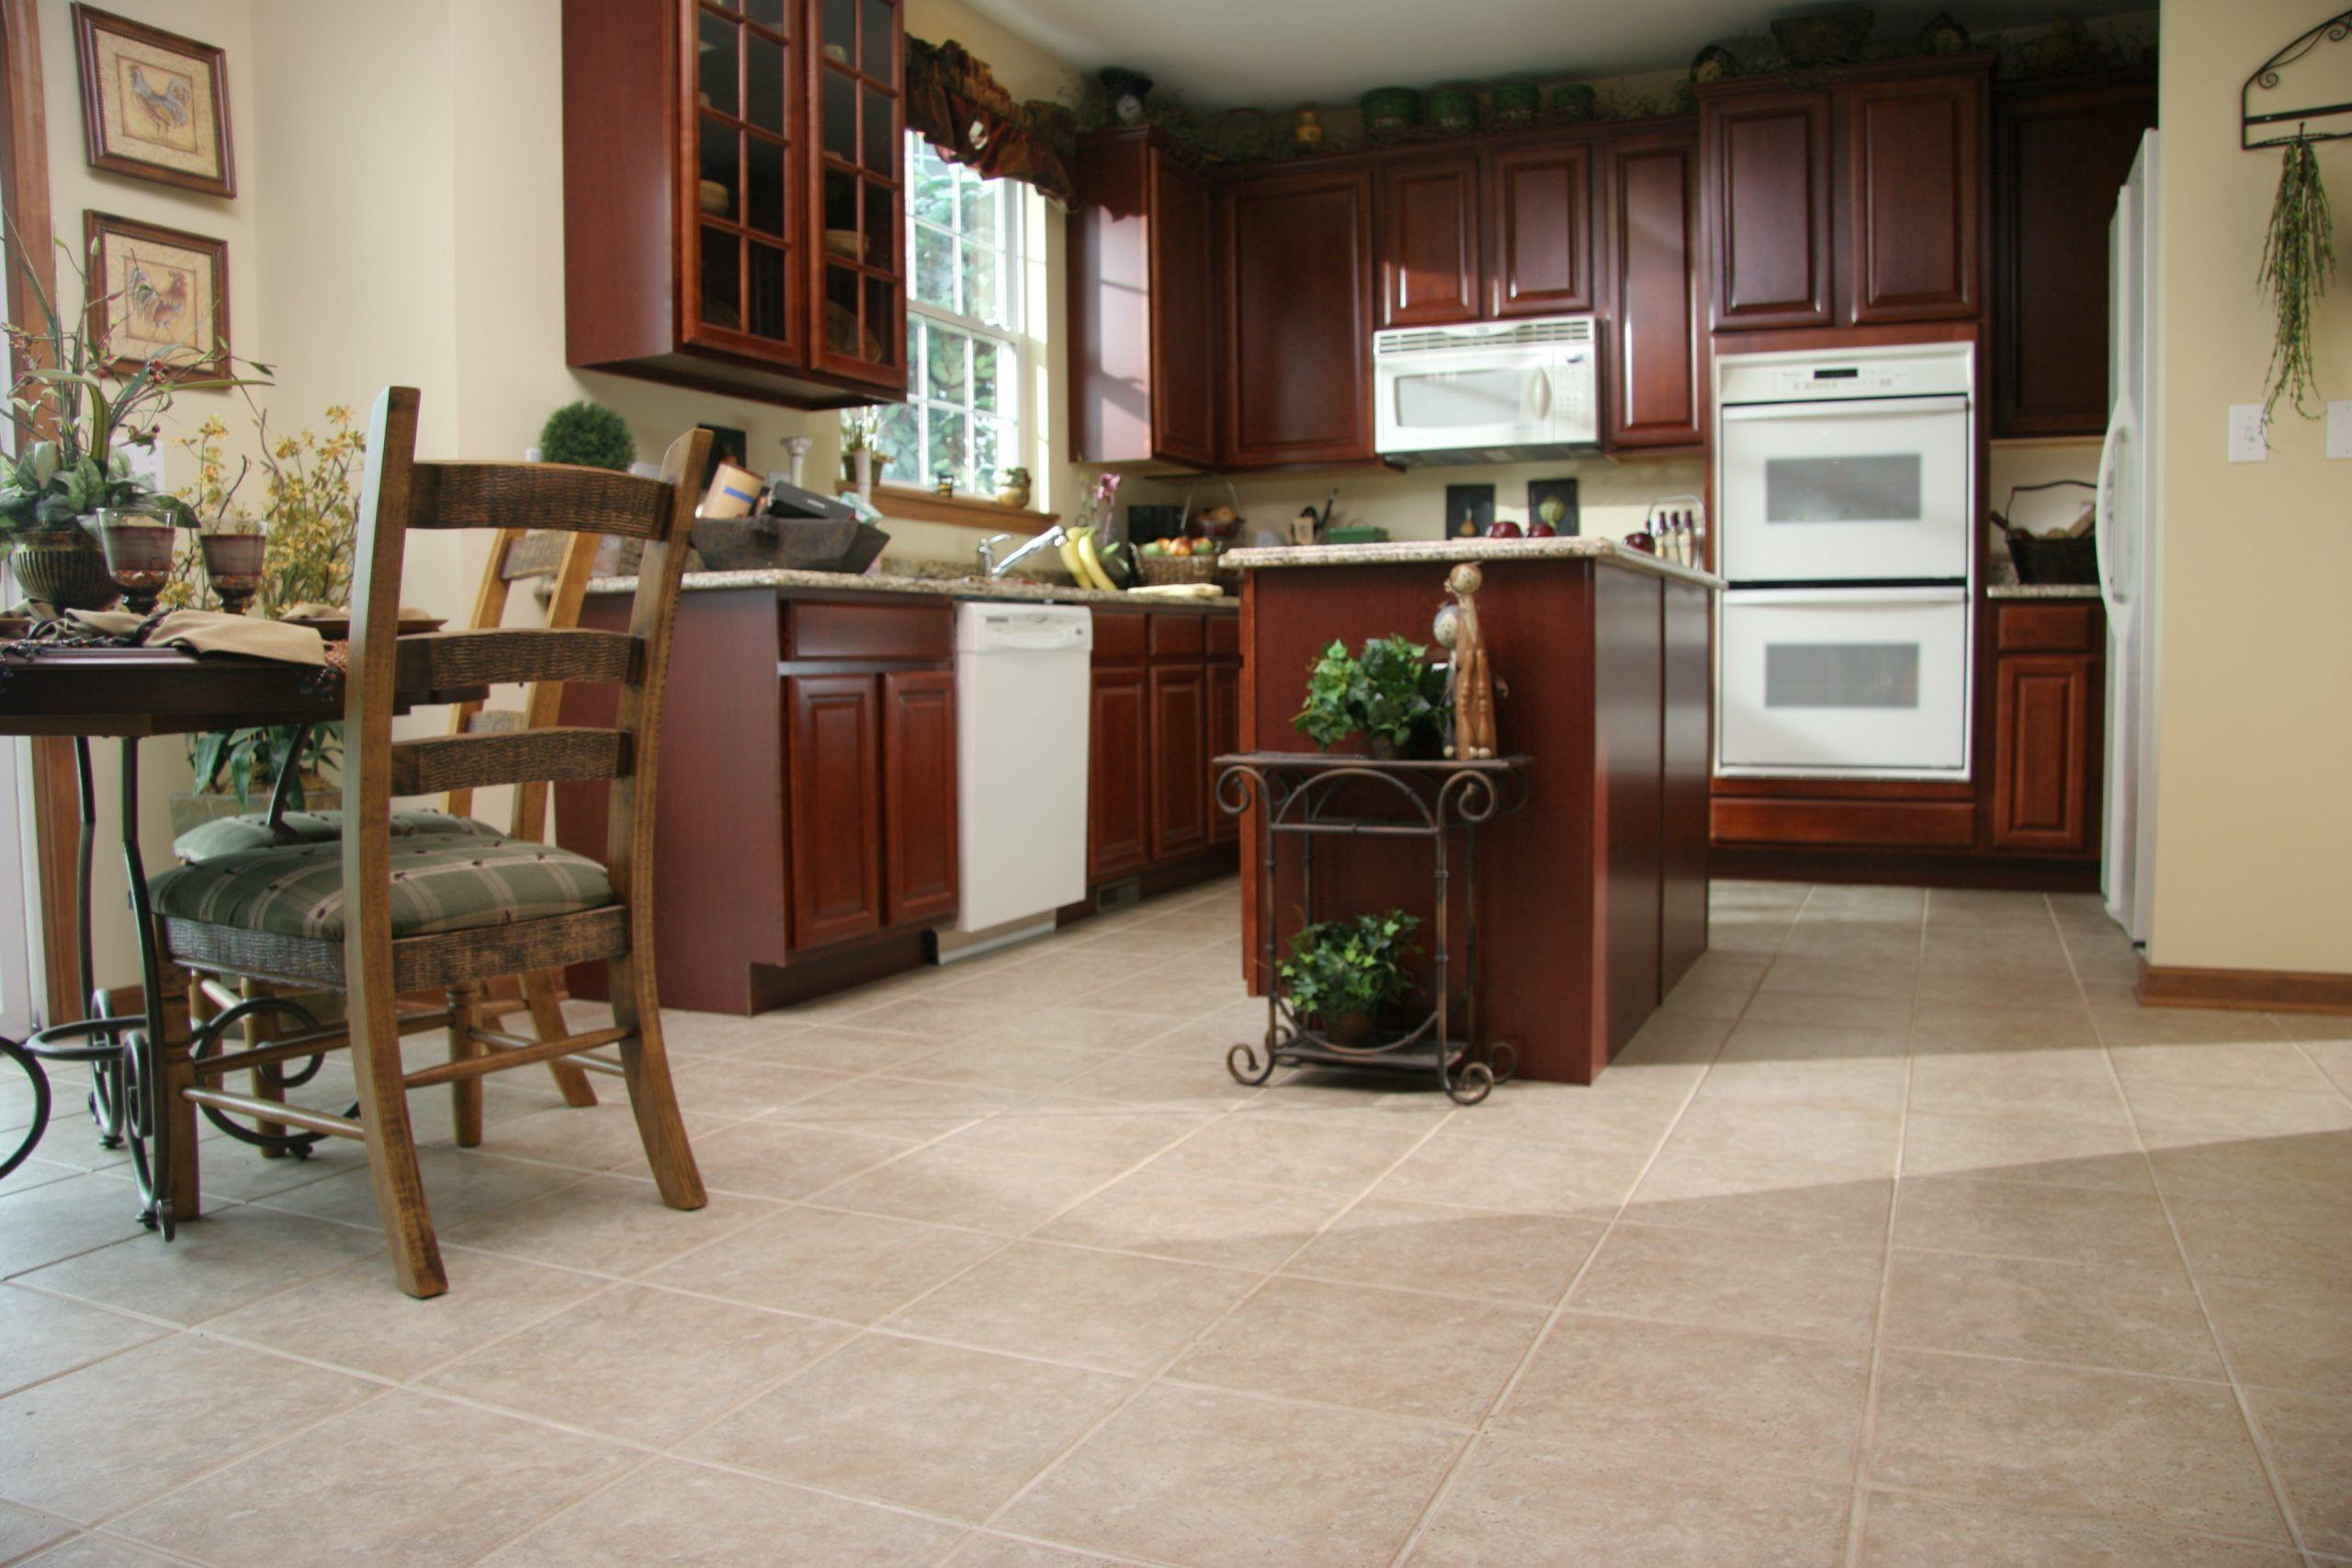 Floating Kitchen Floor Tiles New Home Design Plus Home ...